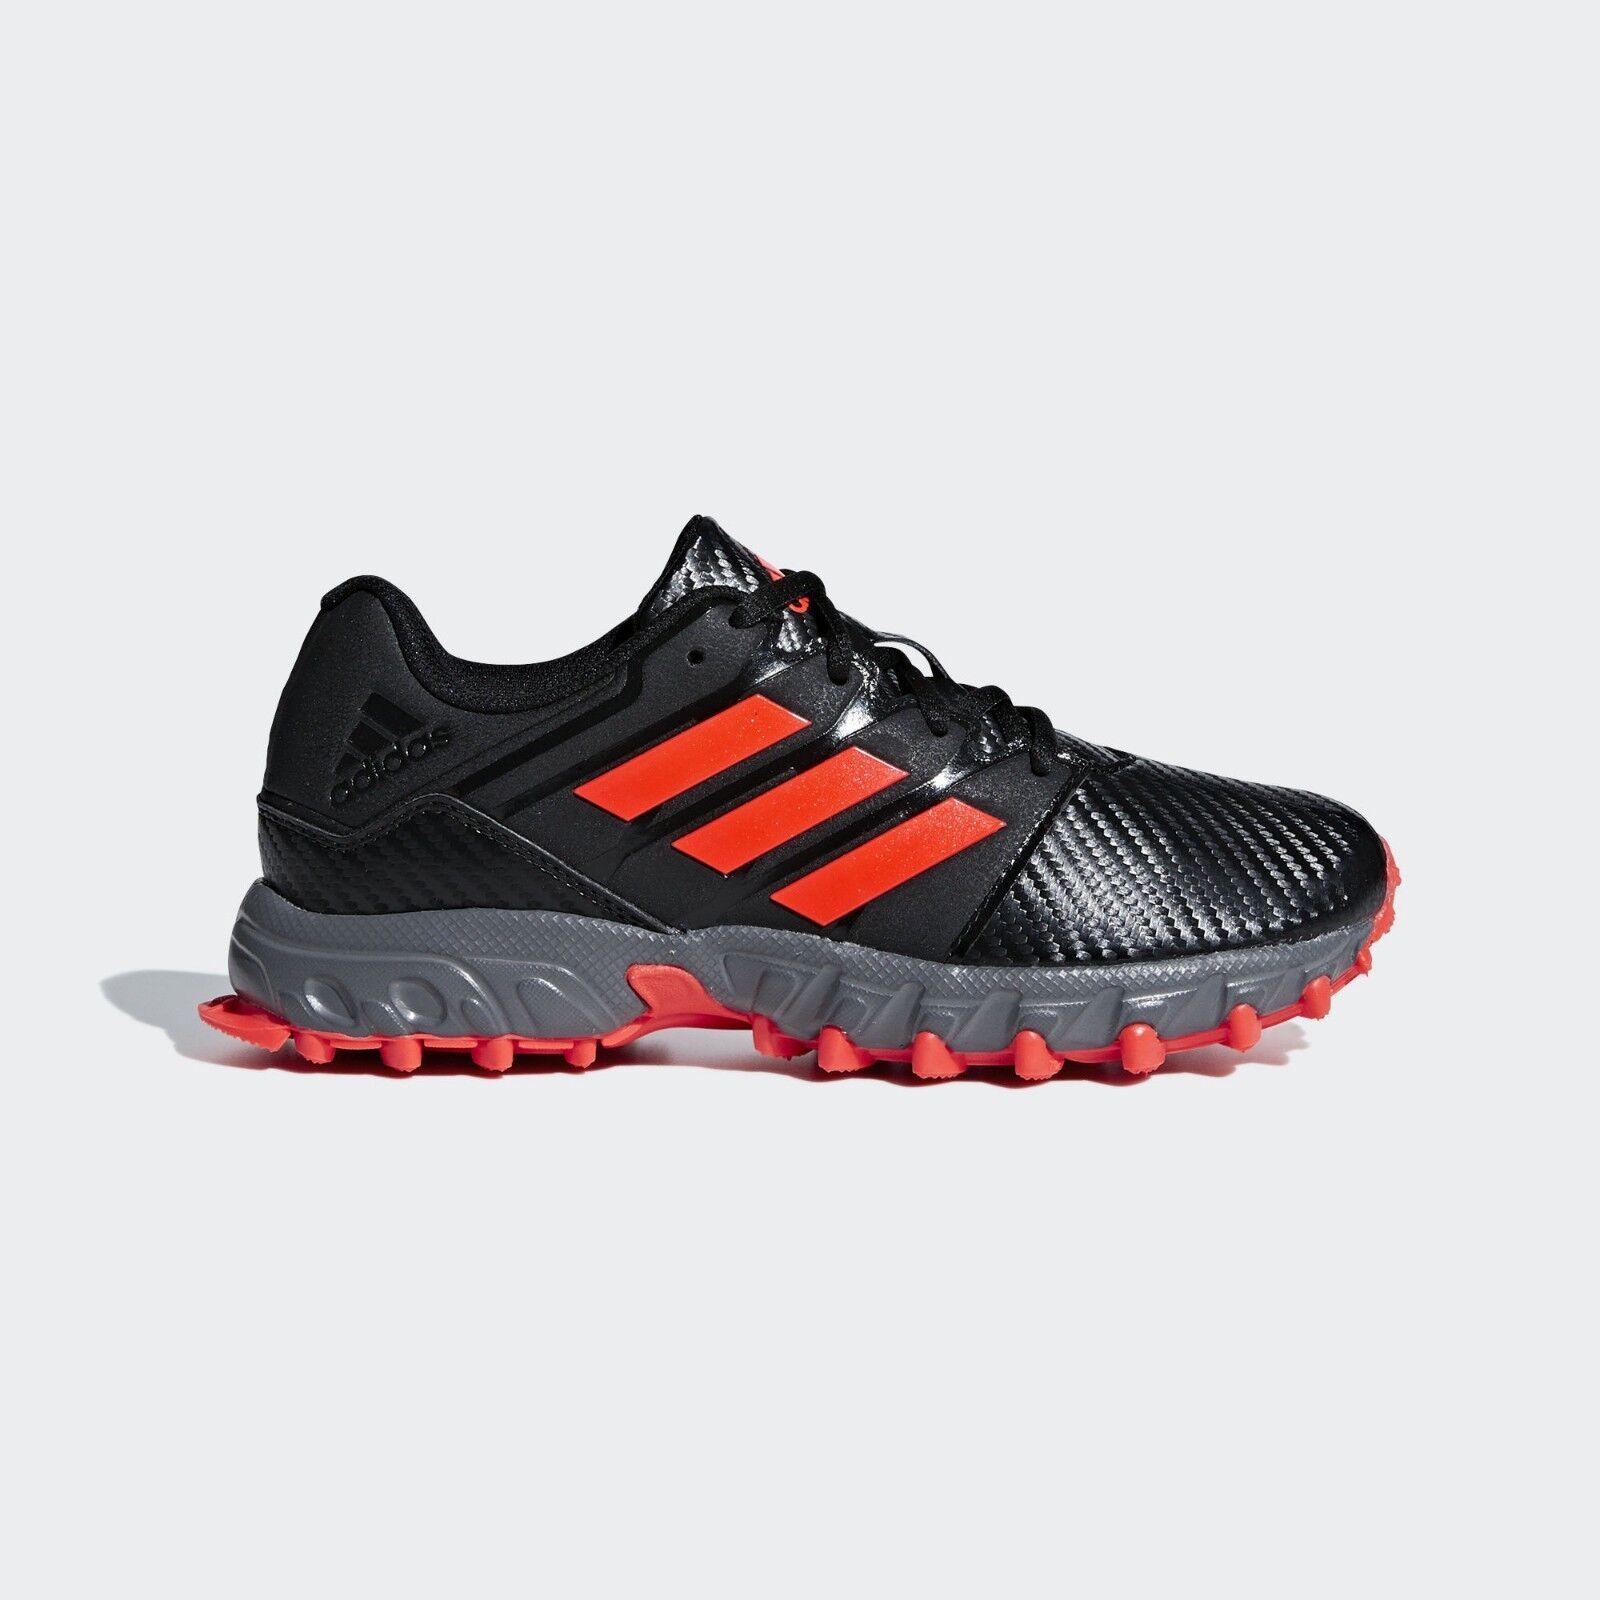 buy popular 5eebd 8c23f adidas Lux Junior Field Hockey Shoes Kids Boys  Girls Unisex Sports  Trainers